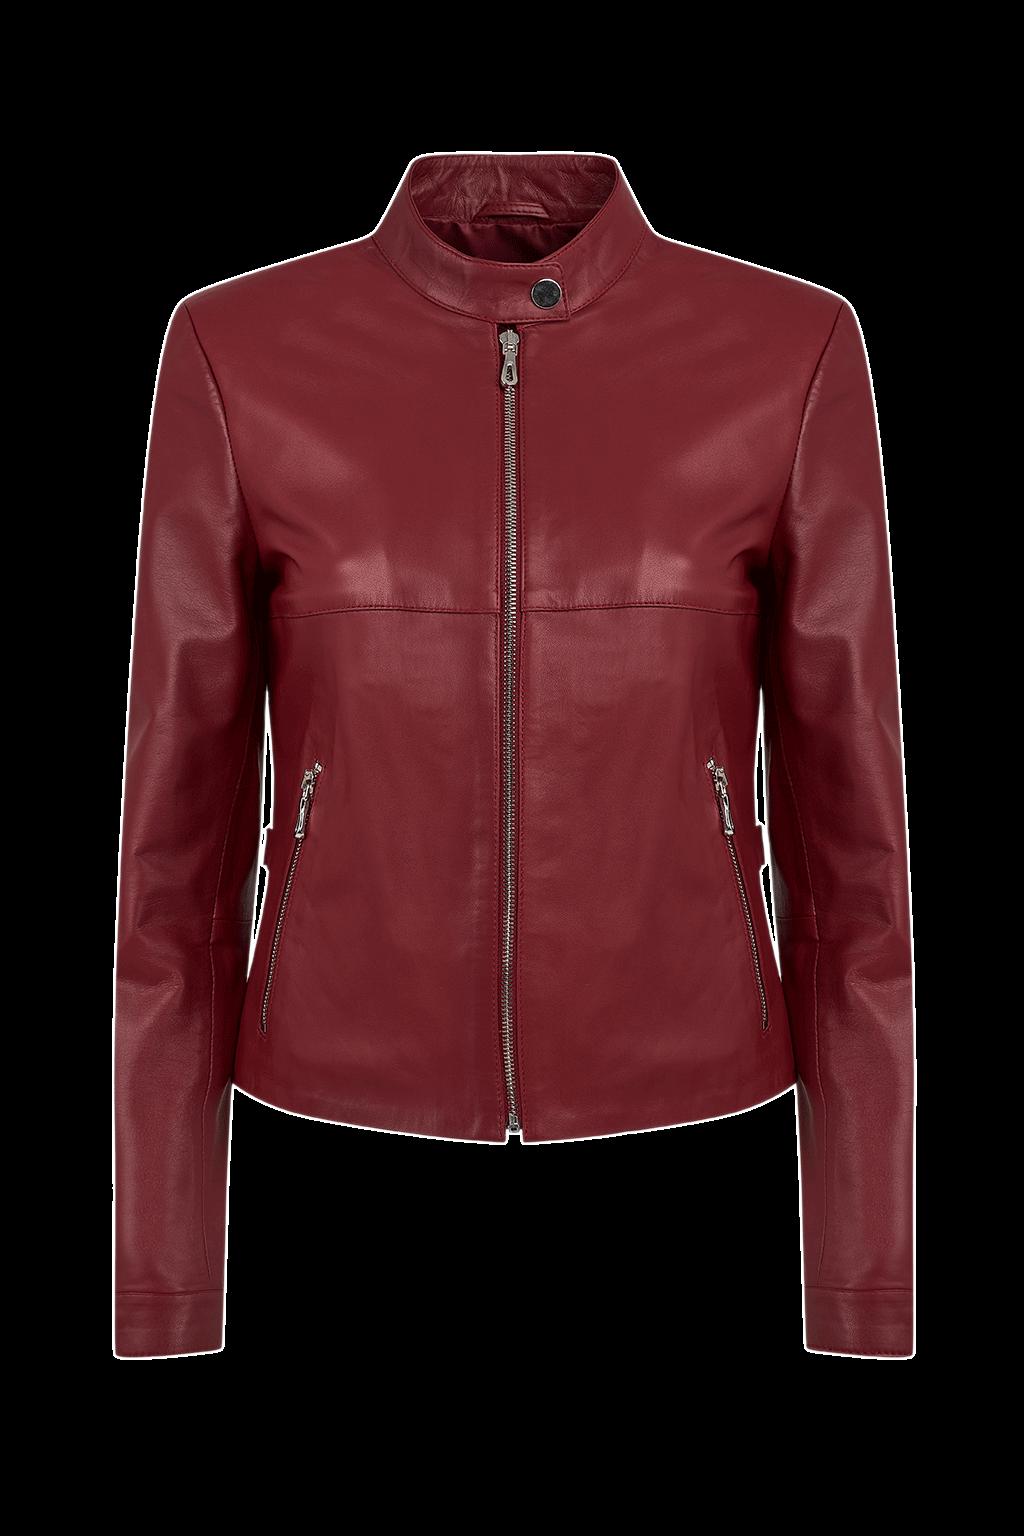 Women's Petite Leather Jacket - Dark Red